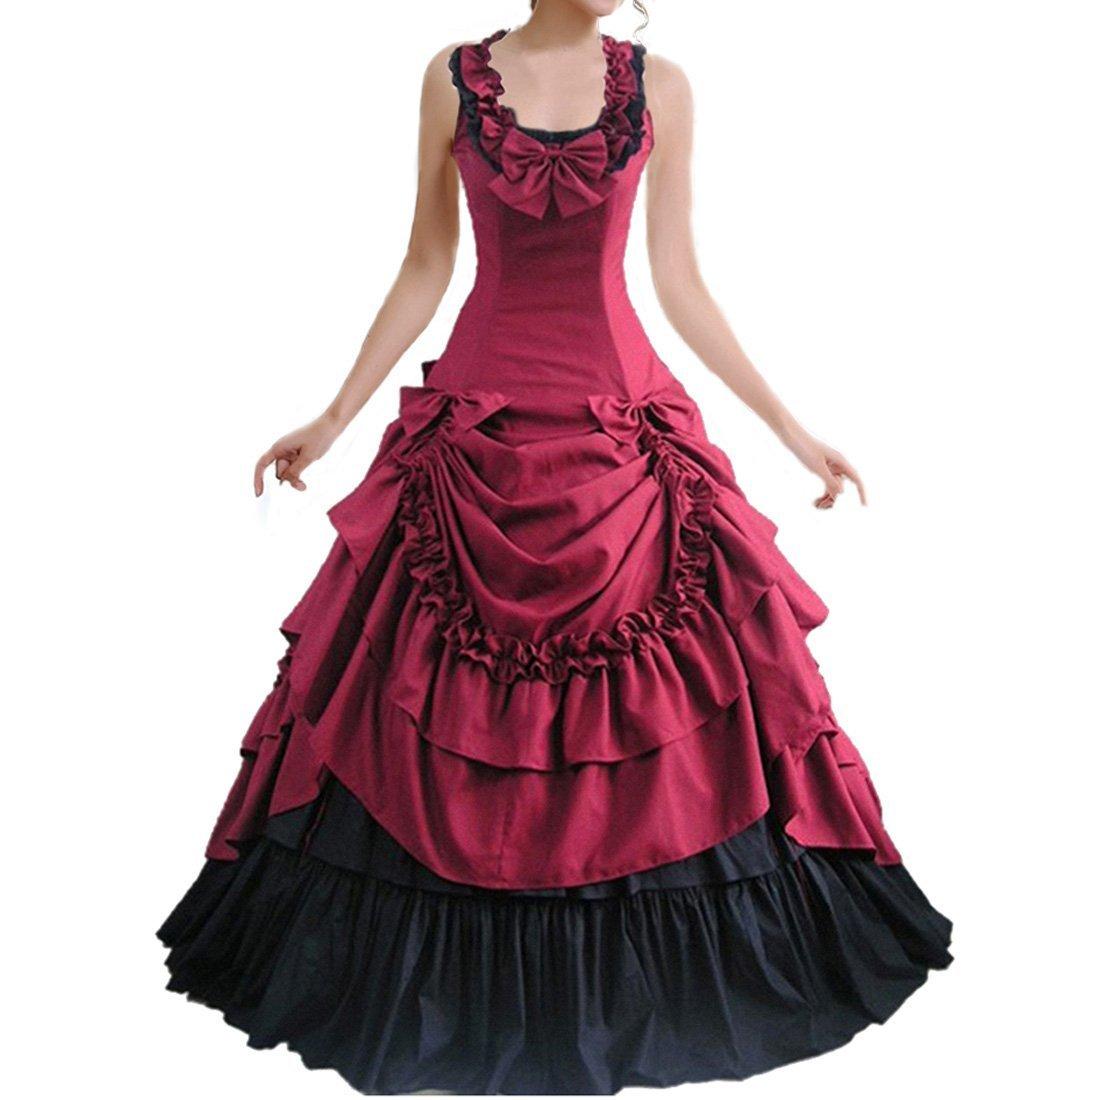 Partiss Bowknot BallGown Gothic Lolita Evening Dress WineRed,X-Large